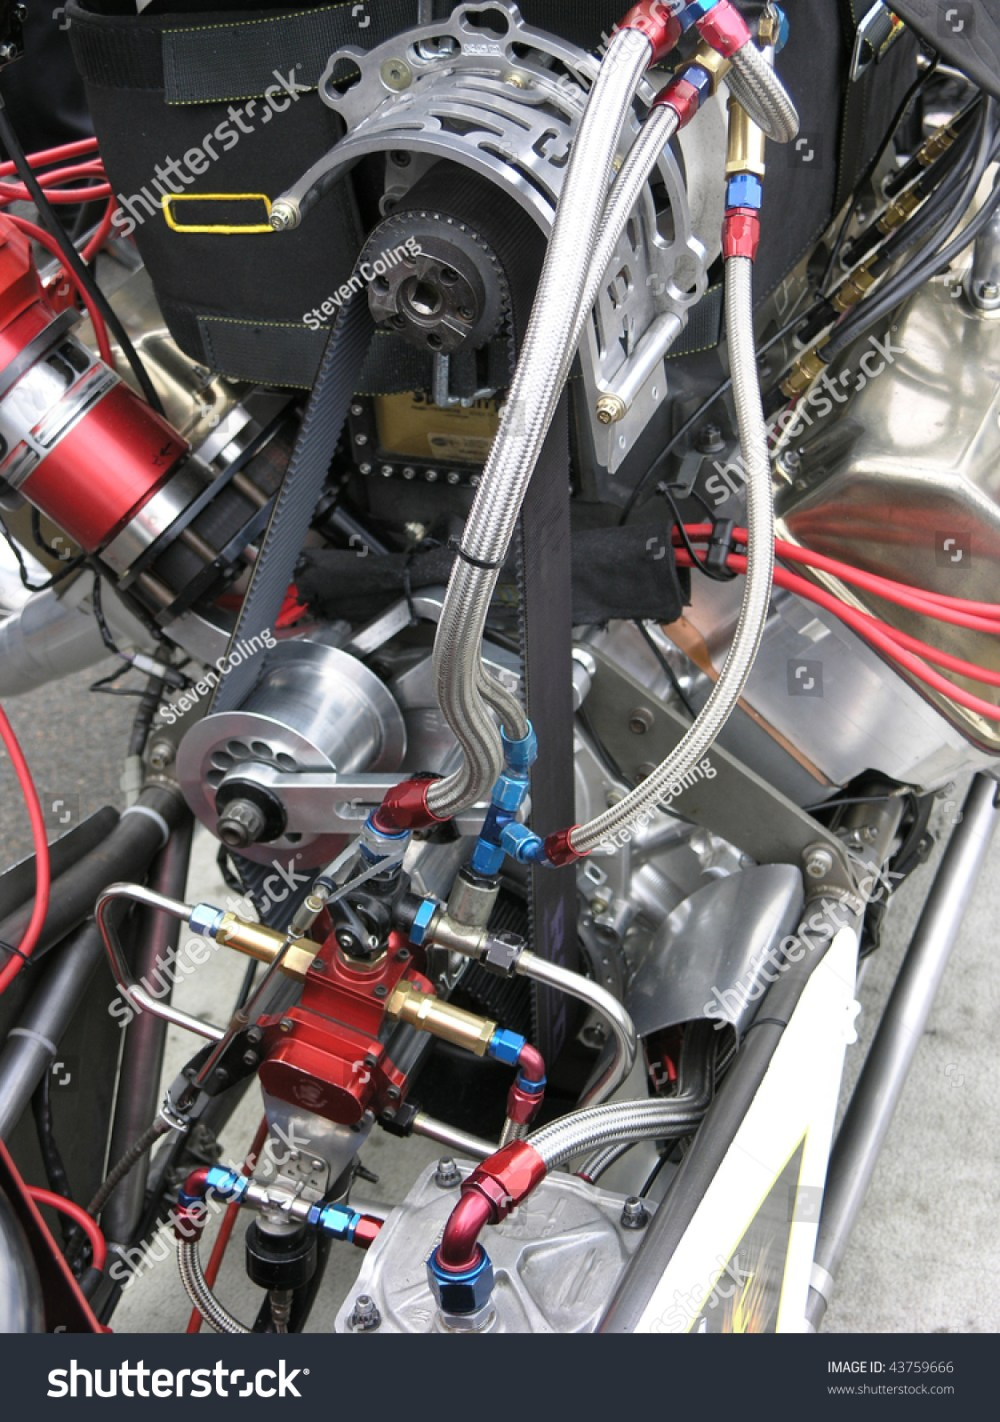 medium resolution of closeup of a top fuel drag car engine